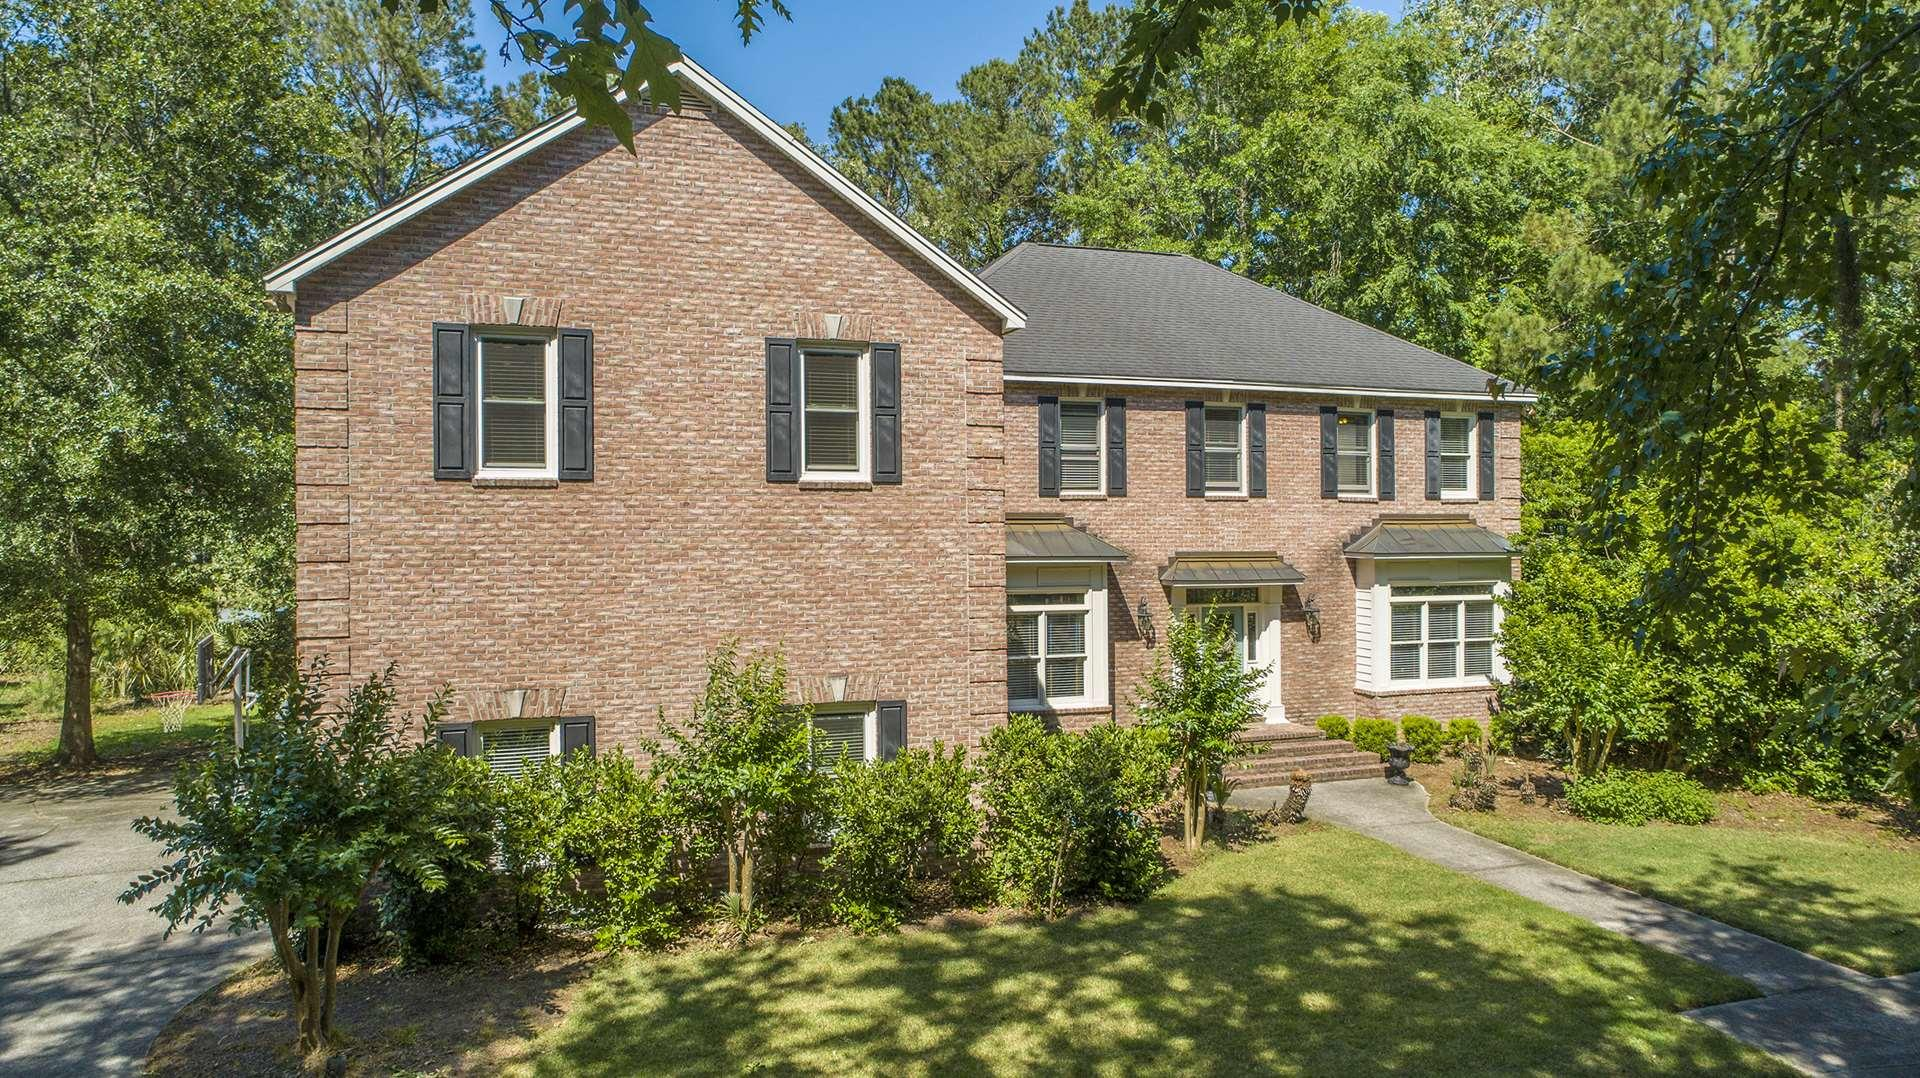 Dunes West Homes For Sale - 2961 Pignatelli, Mount Pleasant, SC - 41